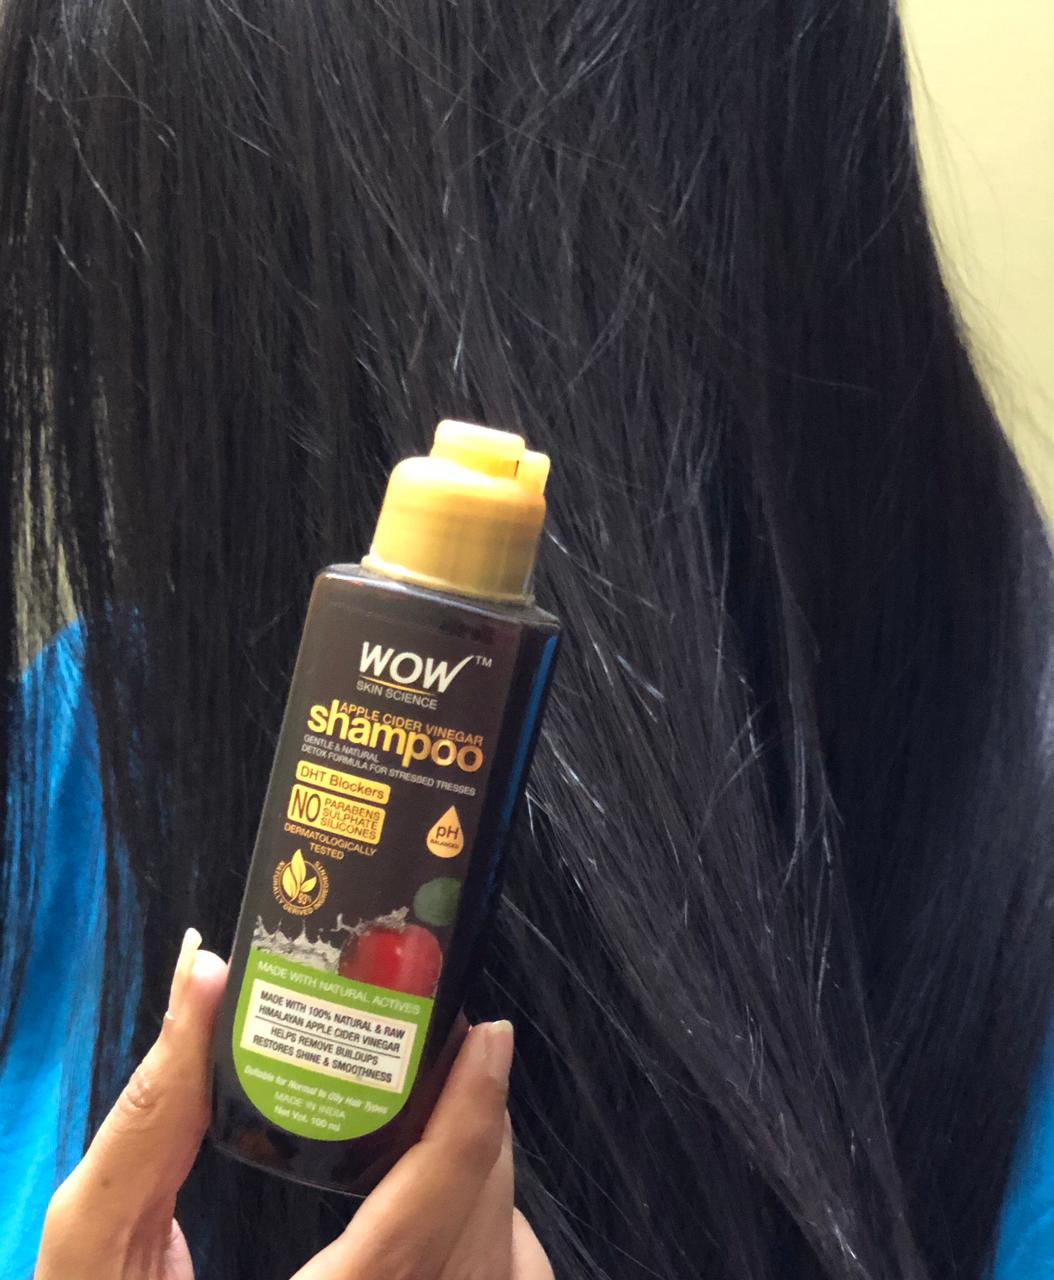 WOW Skin Science Apple Cider Vinegar Shampoo – No Parabens & Sulphate – 300 ml -perfect shampoo for hair fall-By priyankaraj